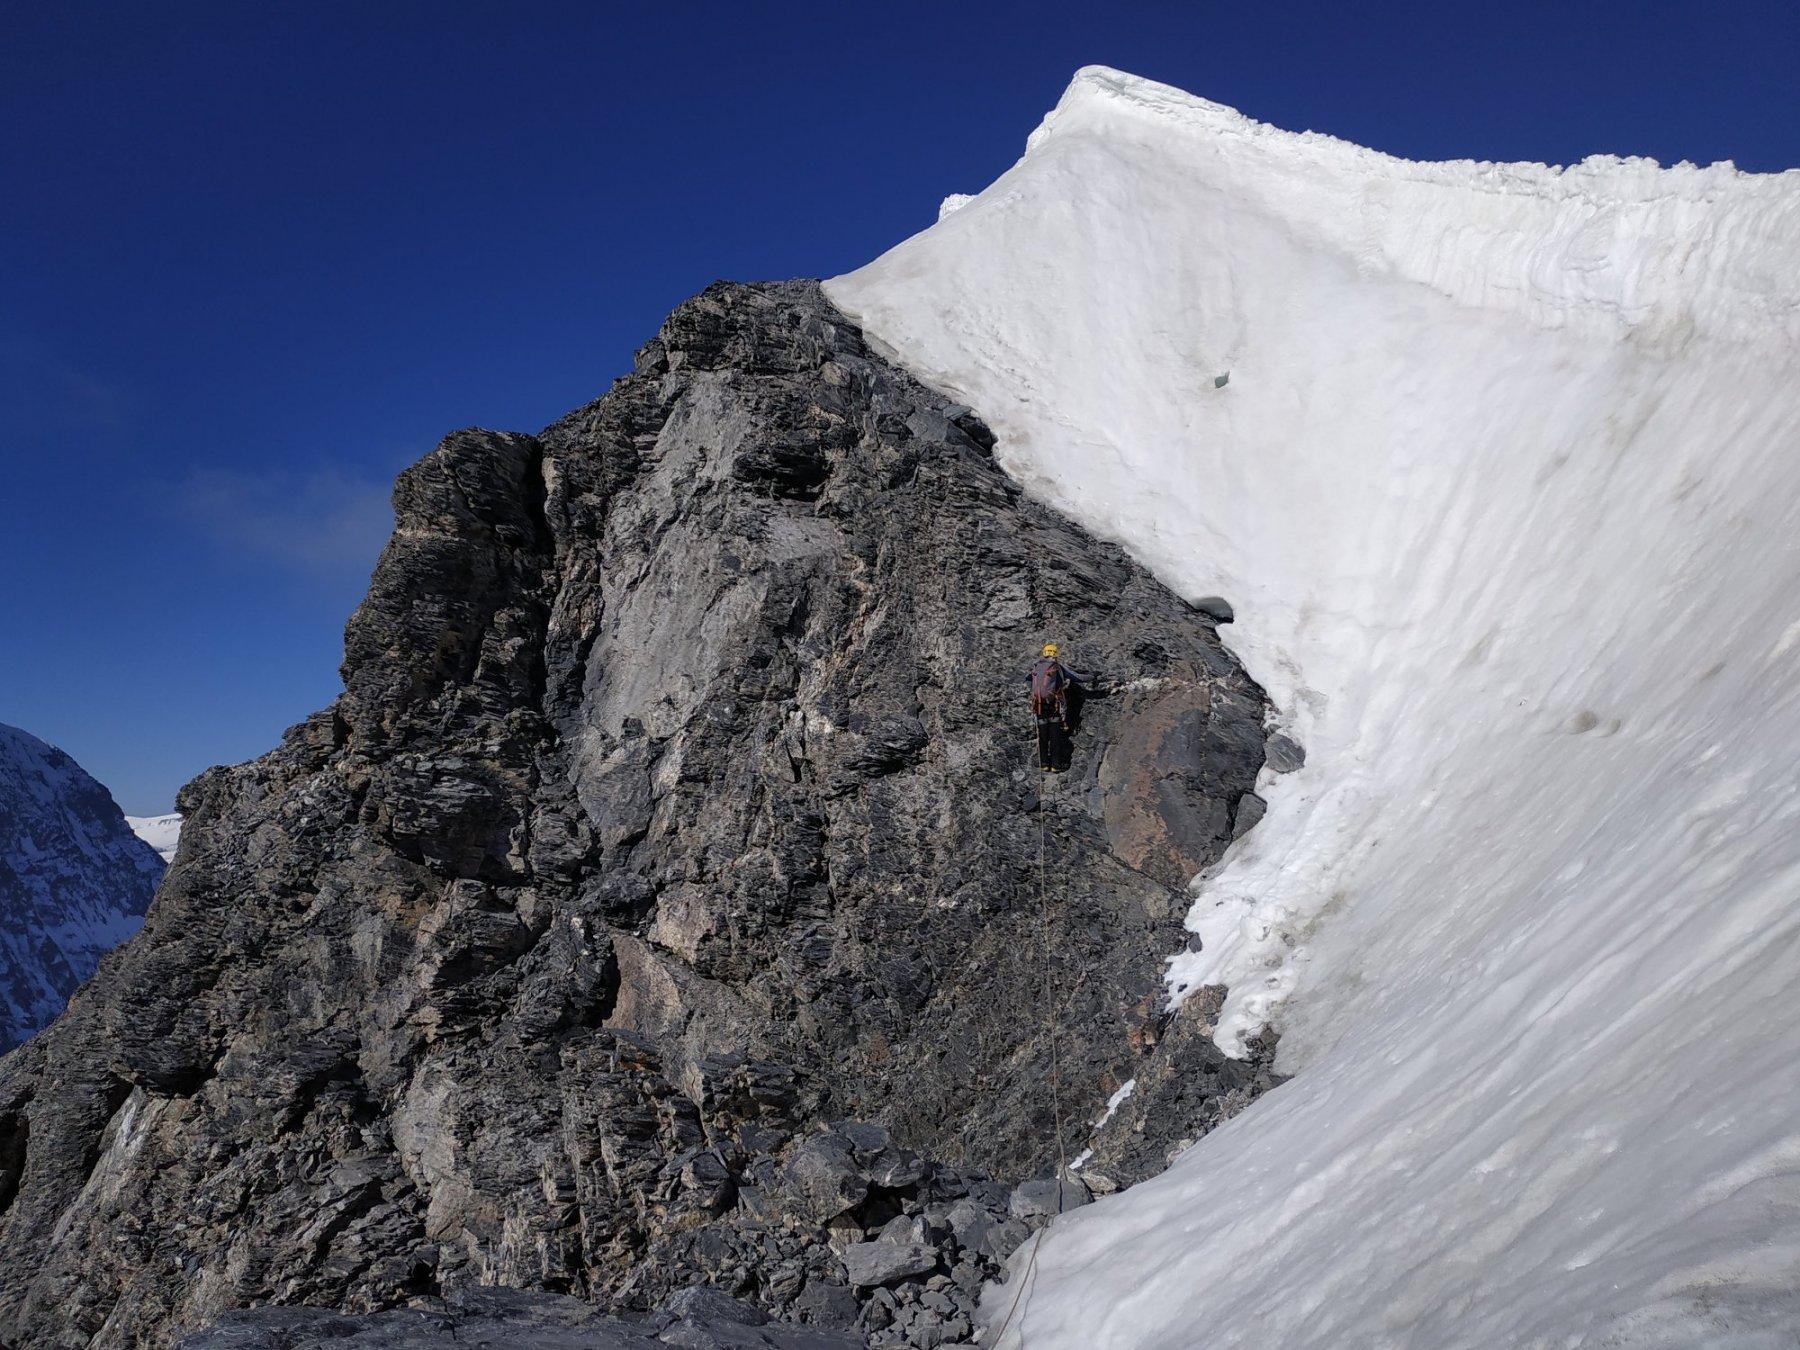 Eiger Cresta Mittellegi alta - Traversata Creste Est-Sud 2018-08-04